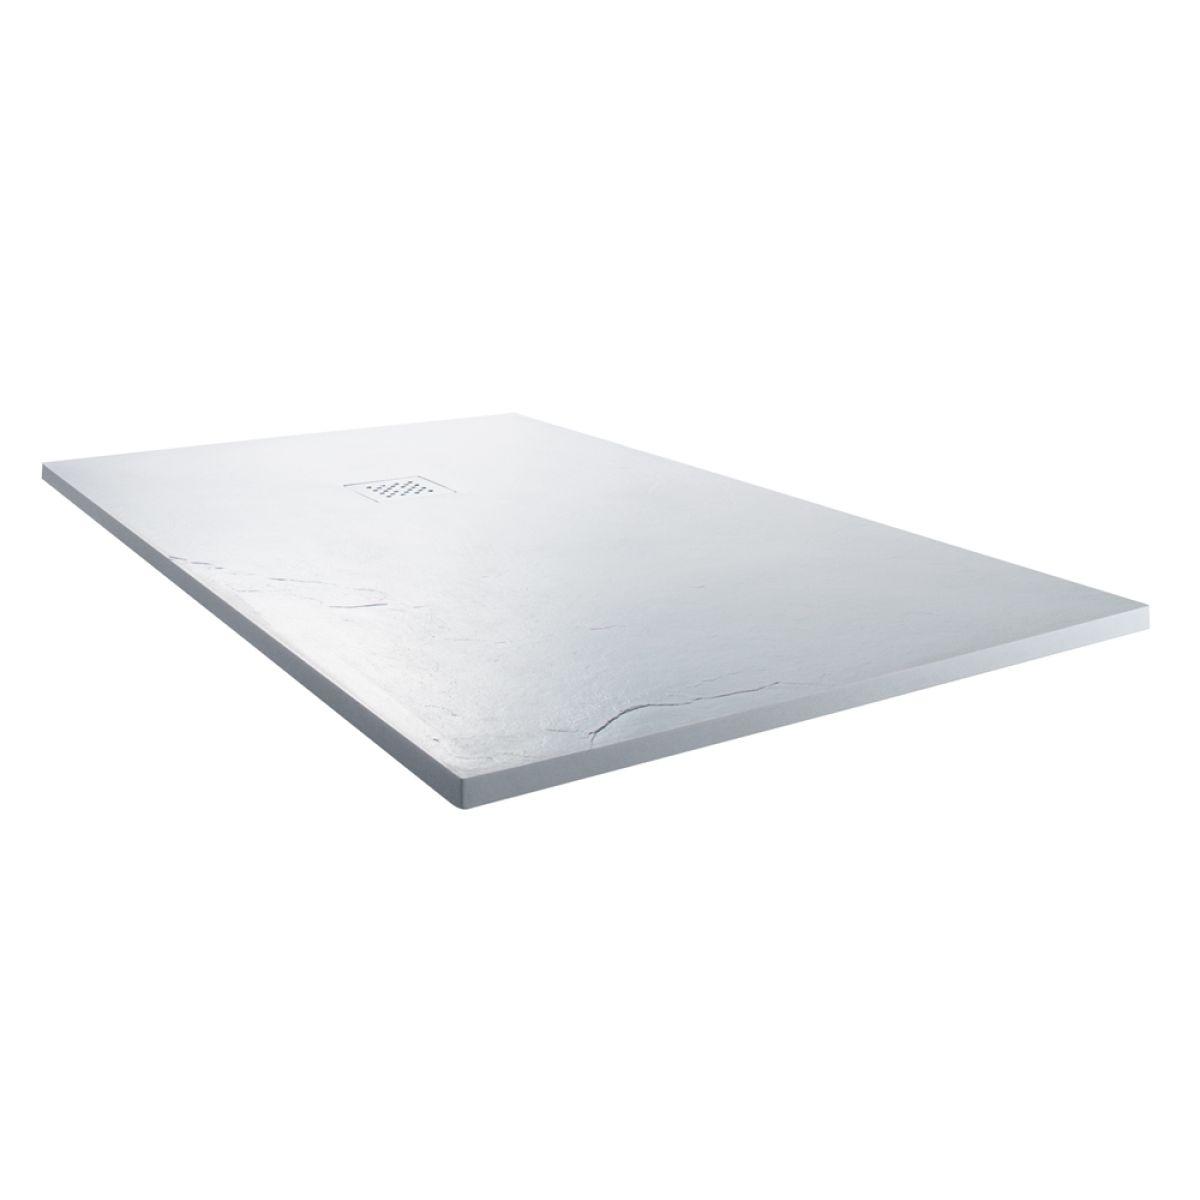 Cassellie Cass Stone White Slate Effect Rectangular Shower Tray 1700 x 900mm